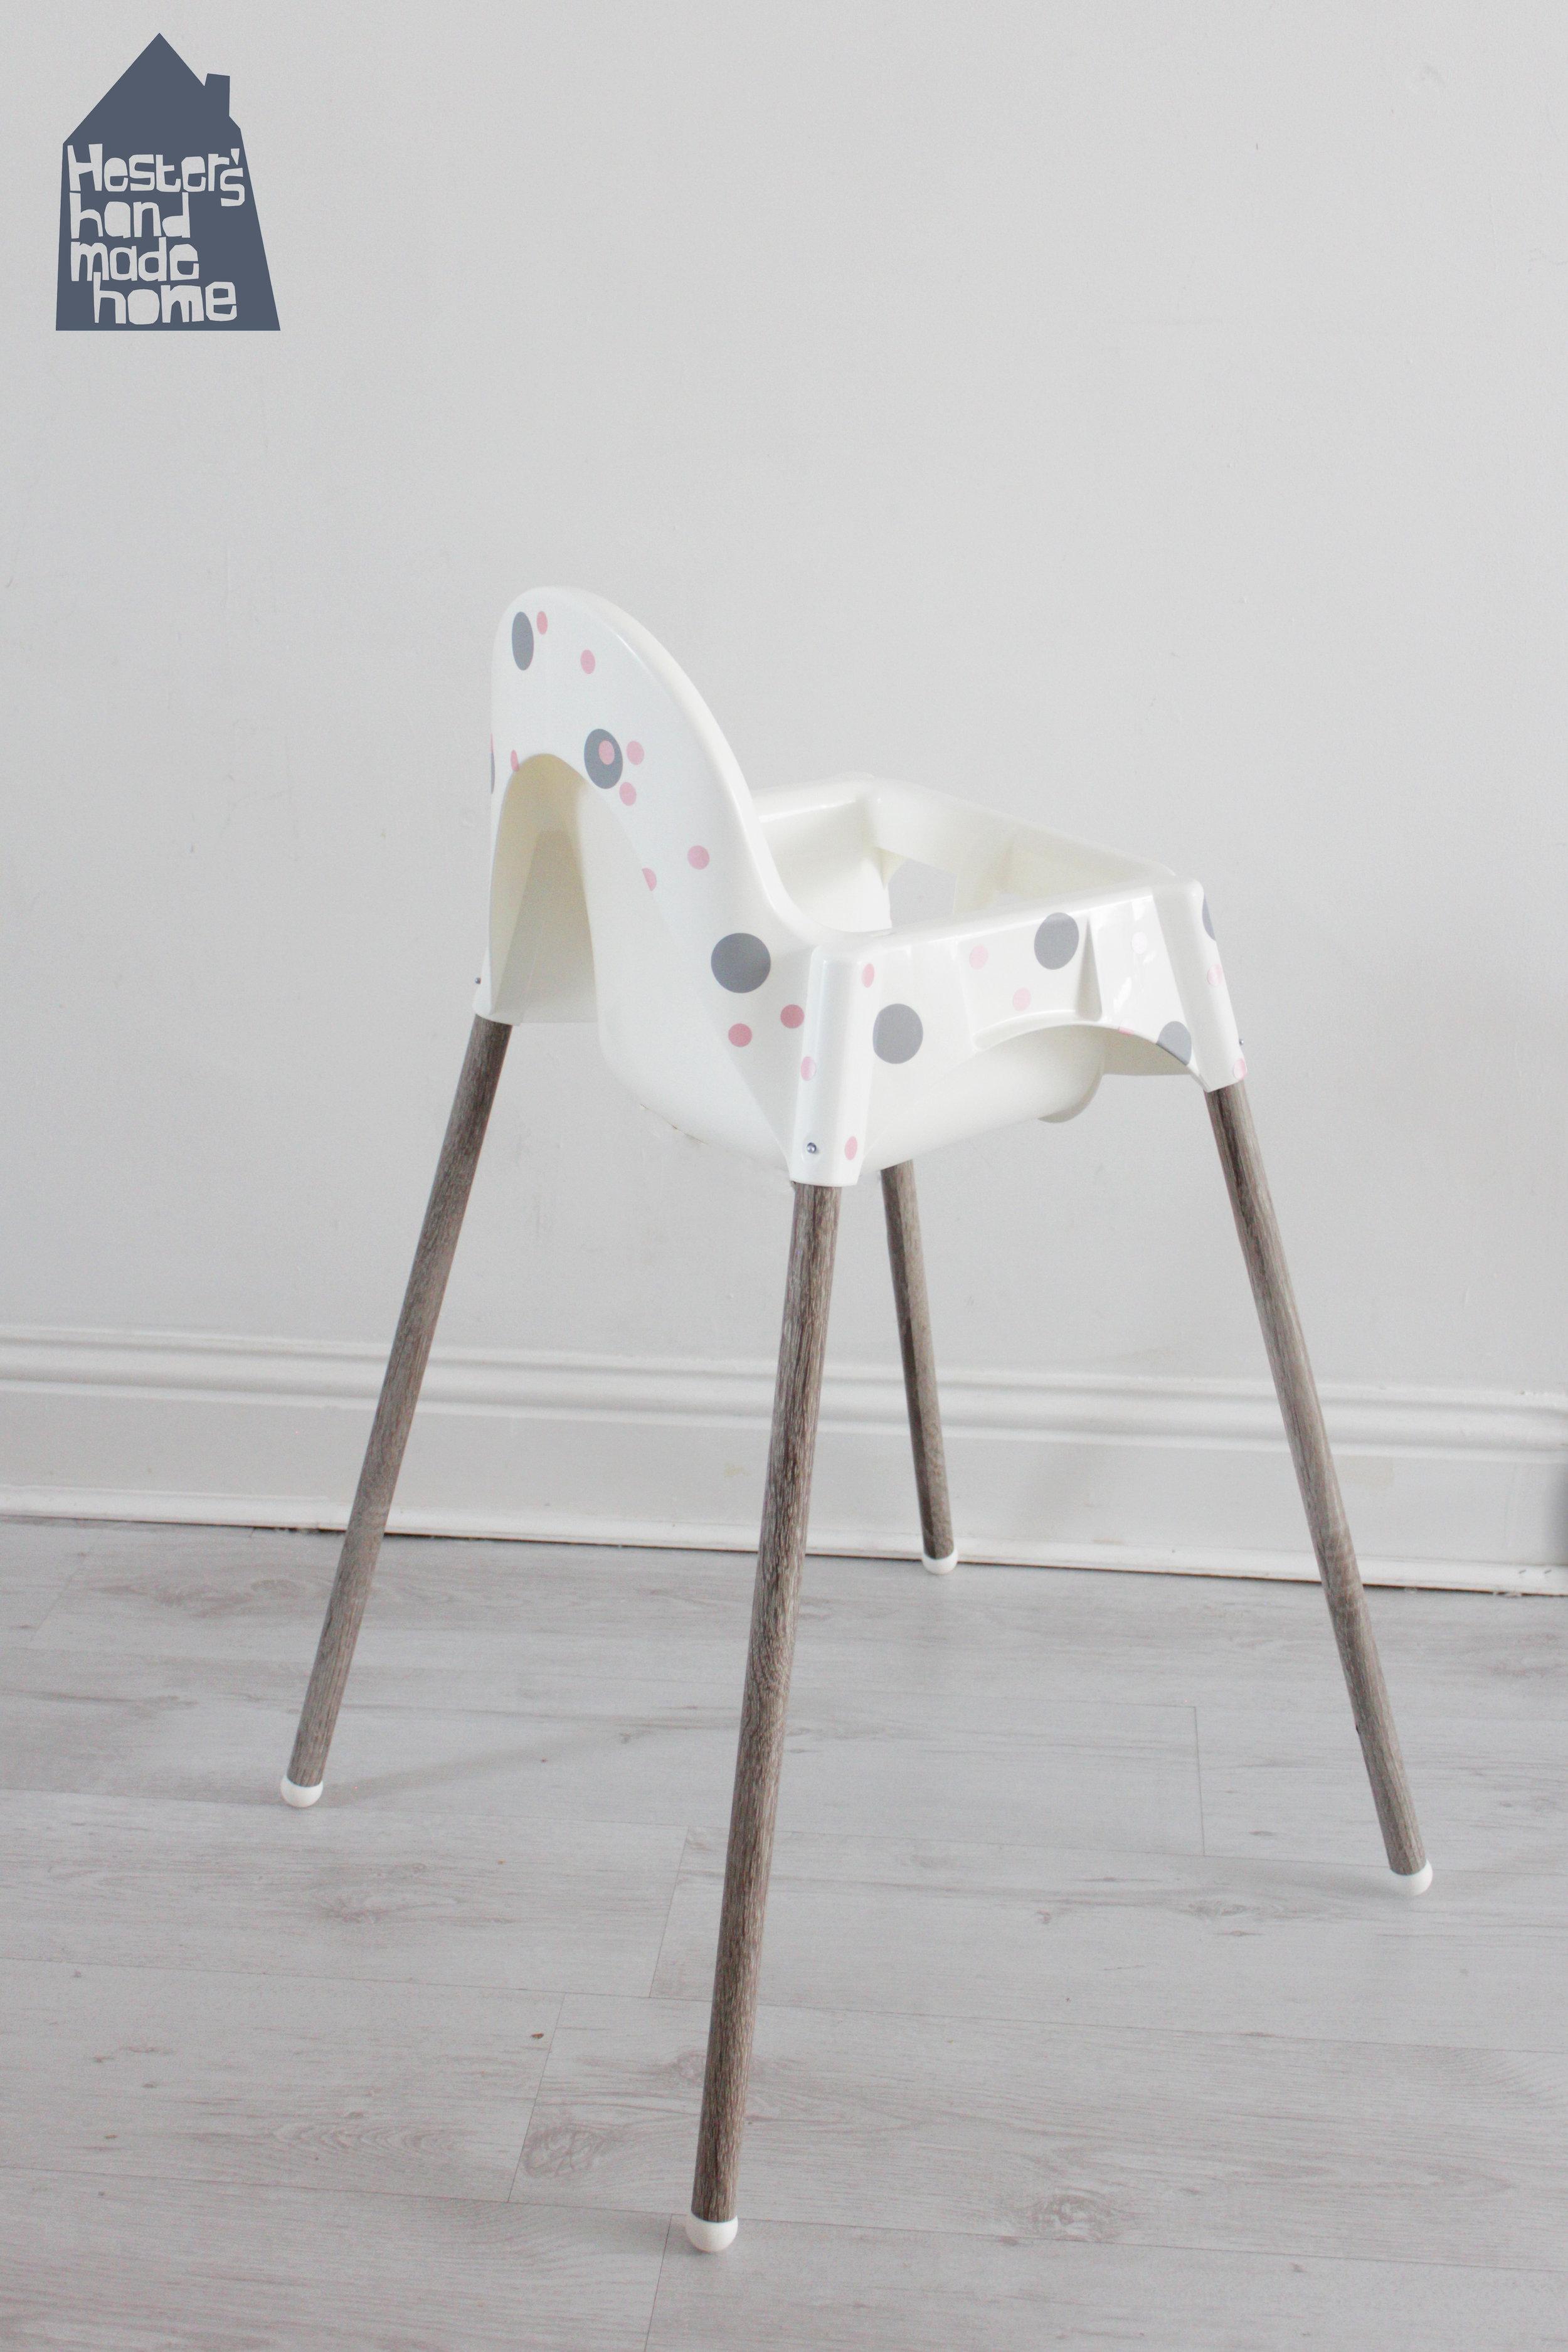 ikea high chair revolving mechanism antilop highchair hack hester s handmade home by www hestershandmadehome com